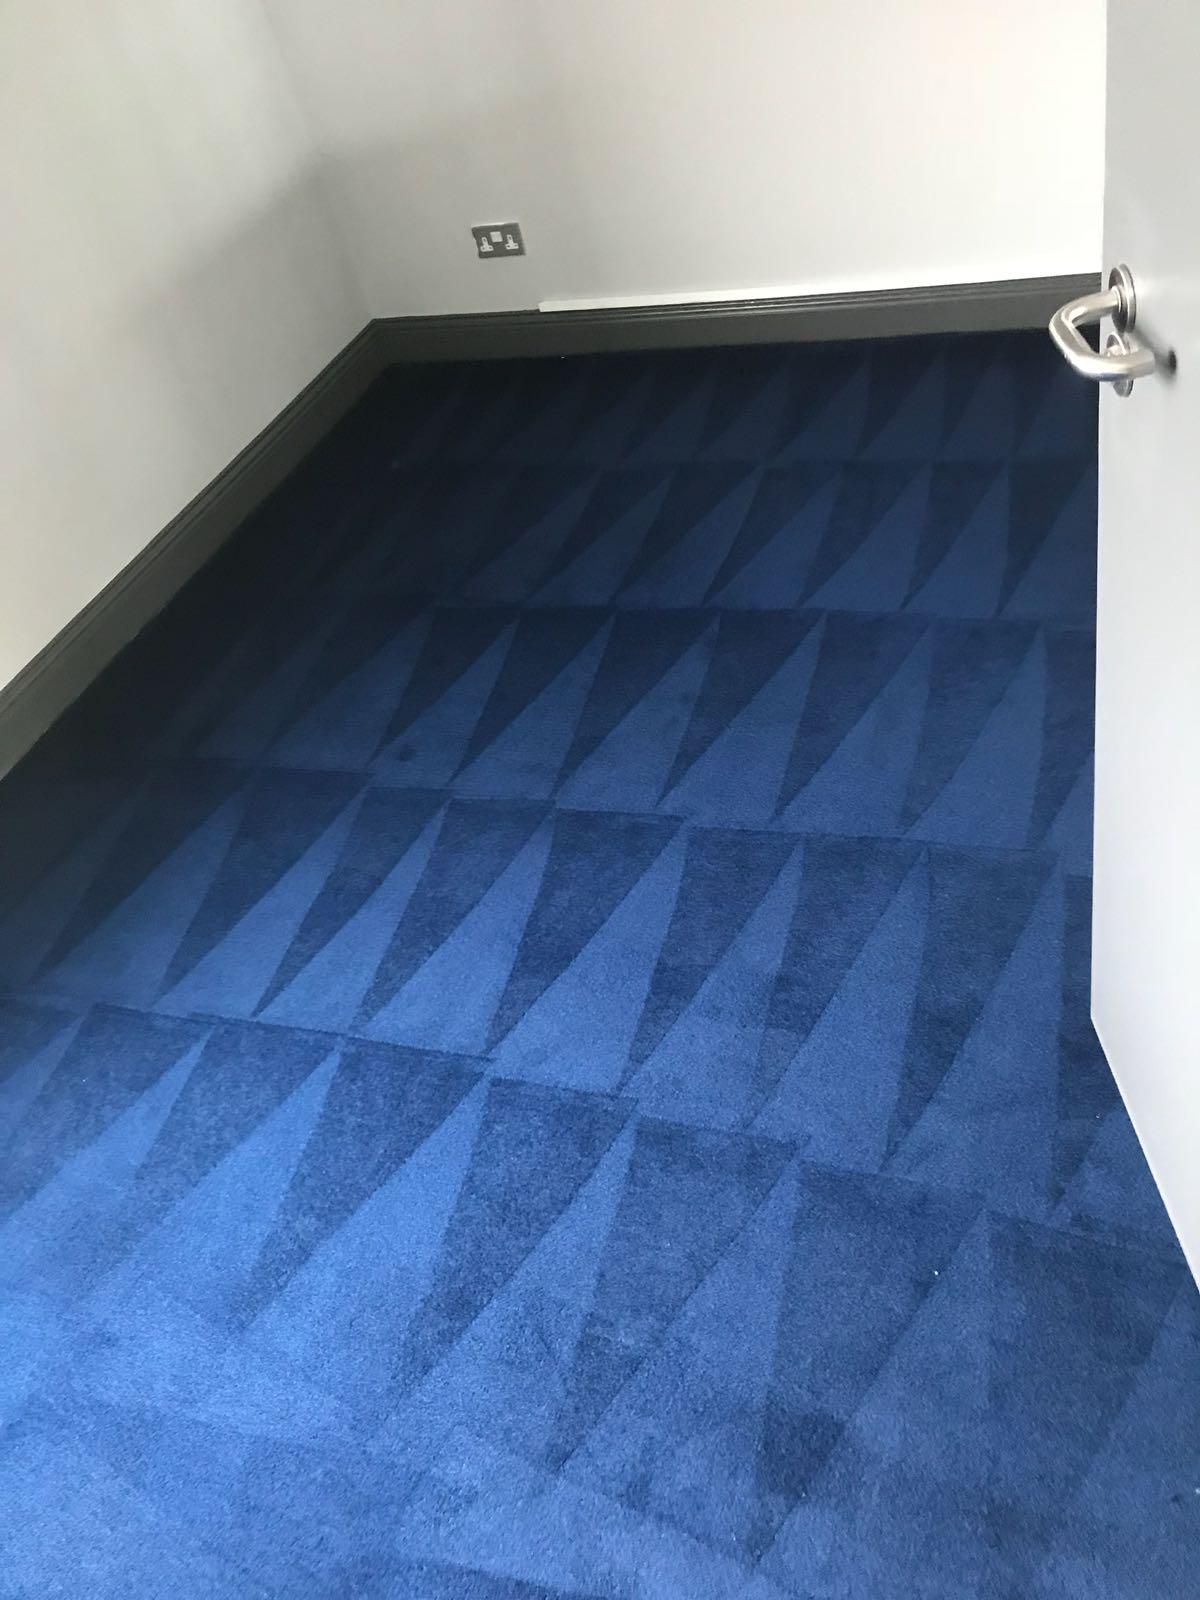 Carpet Cleaning Baldoyle Domestic Amp Commercial Carpet